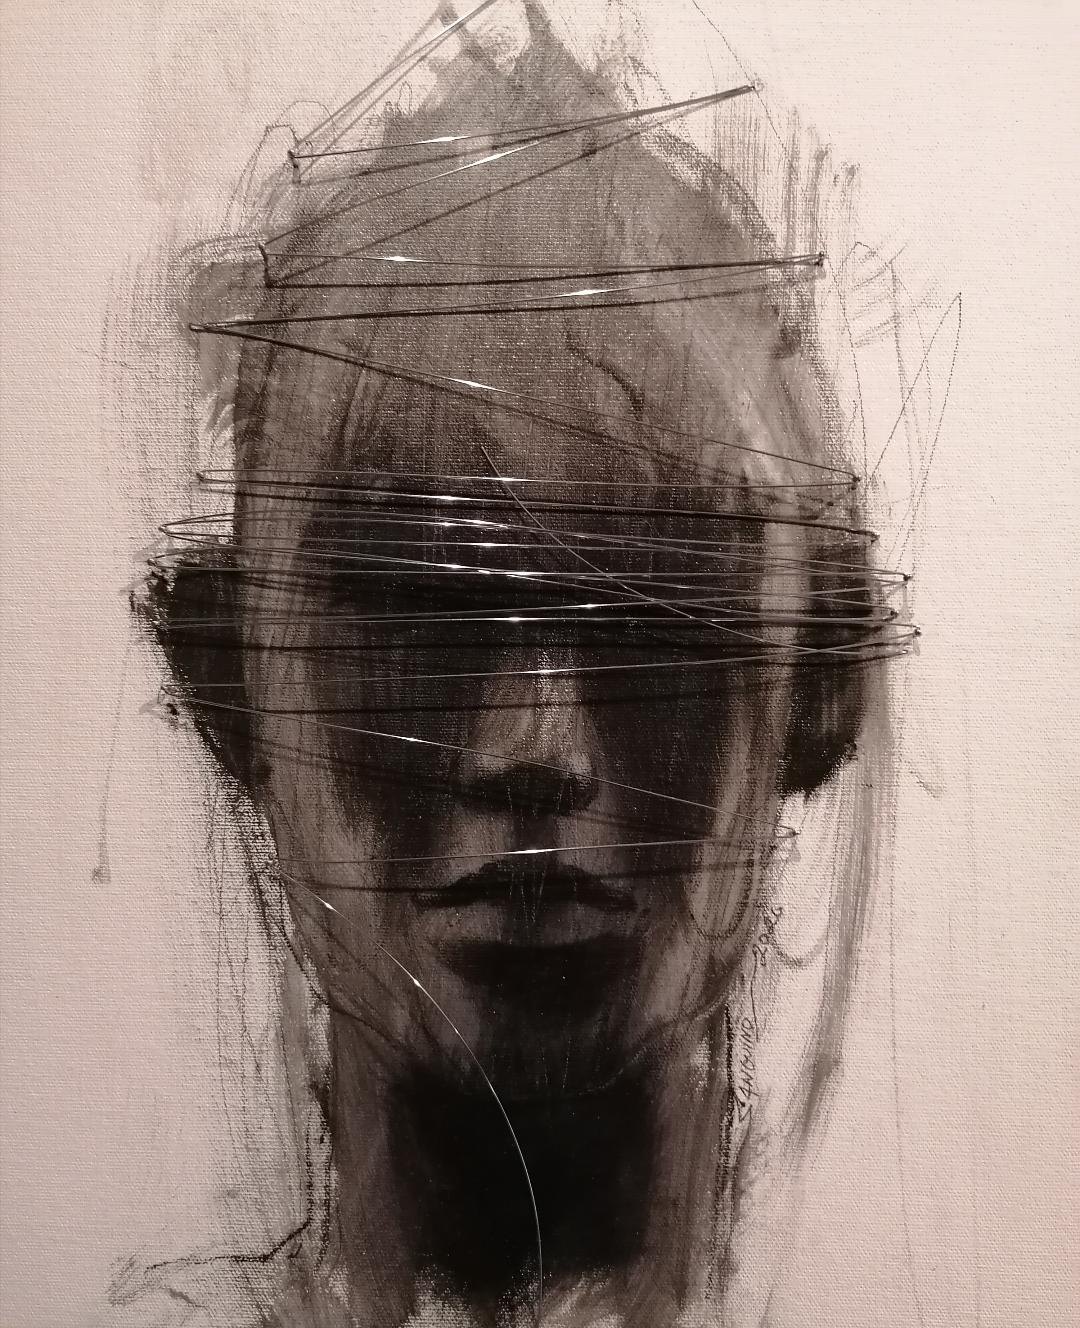 """Geometría est imago XXVII"". (Retrato con geometría XXVII) (2020) - Roger Sanguino"